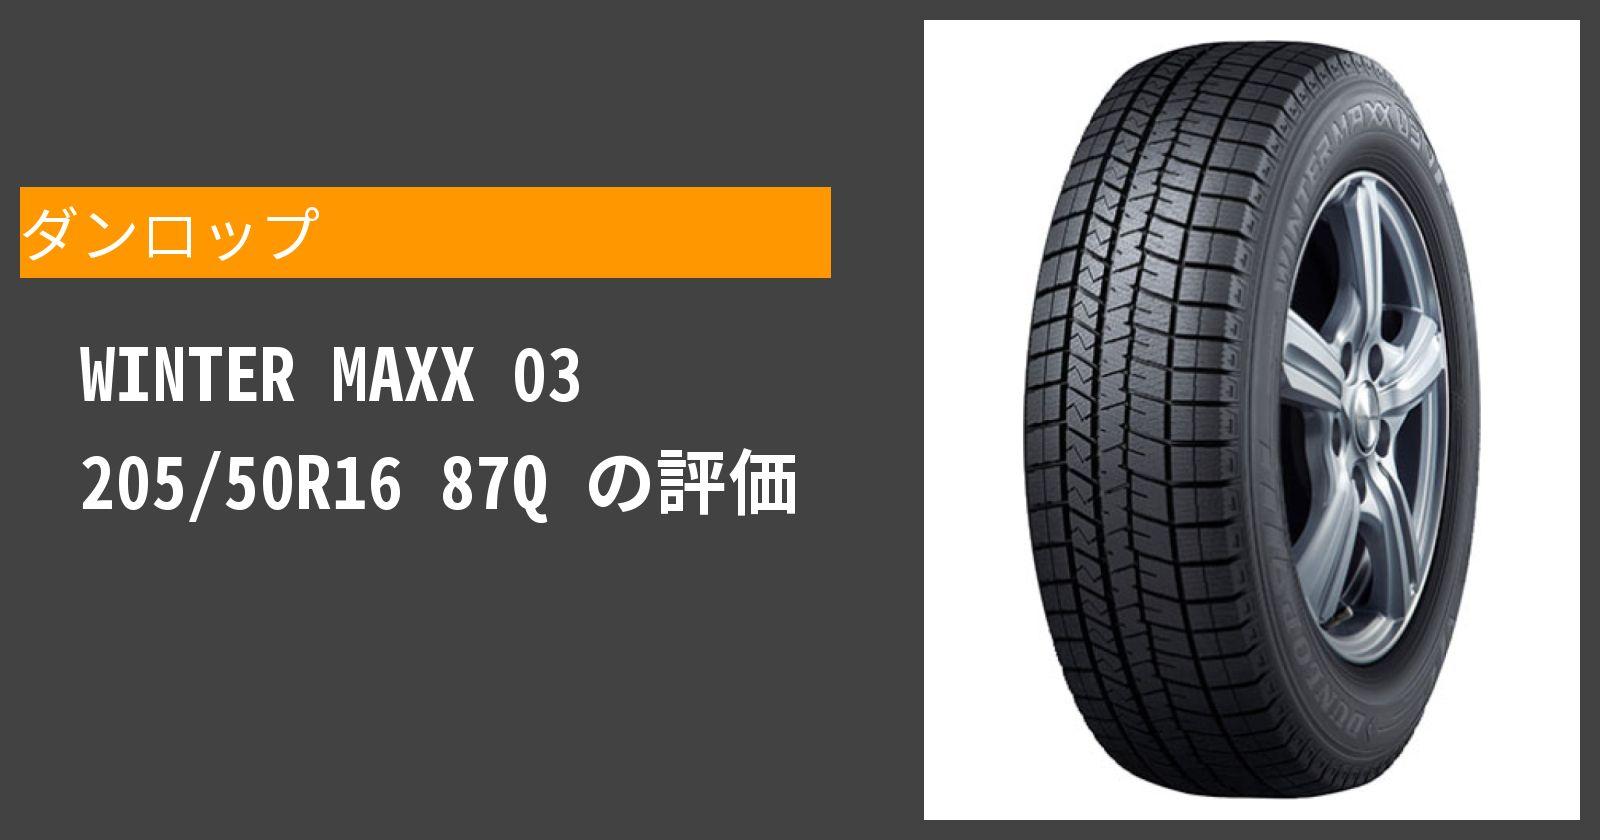 WINTER MAXX 03 205/50R16 87Qを徹底評価